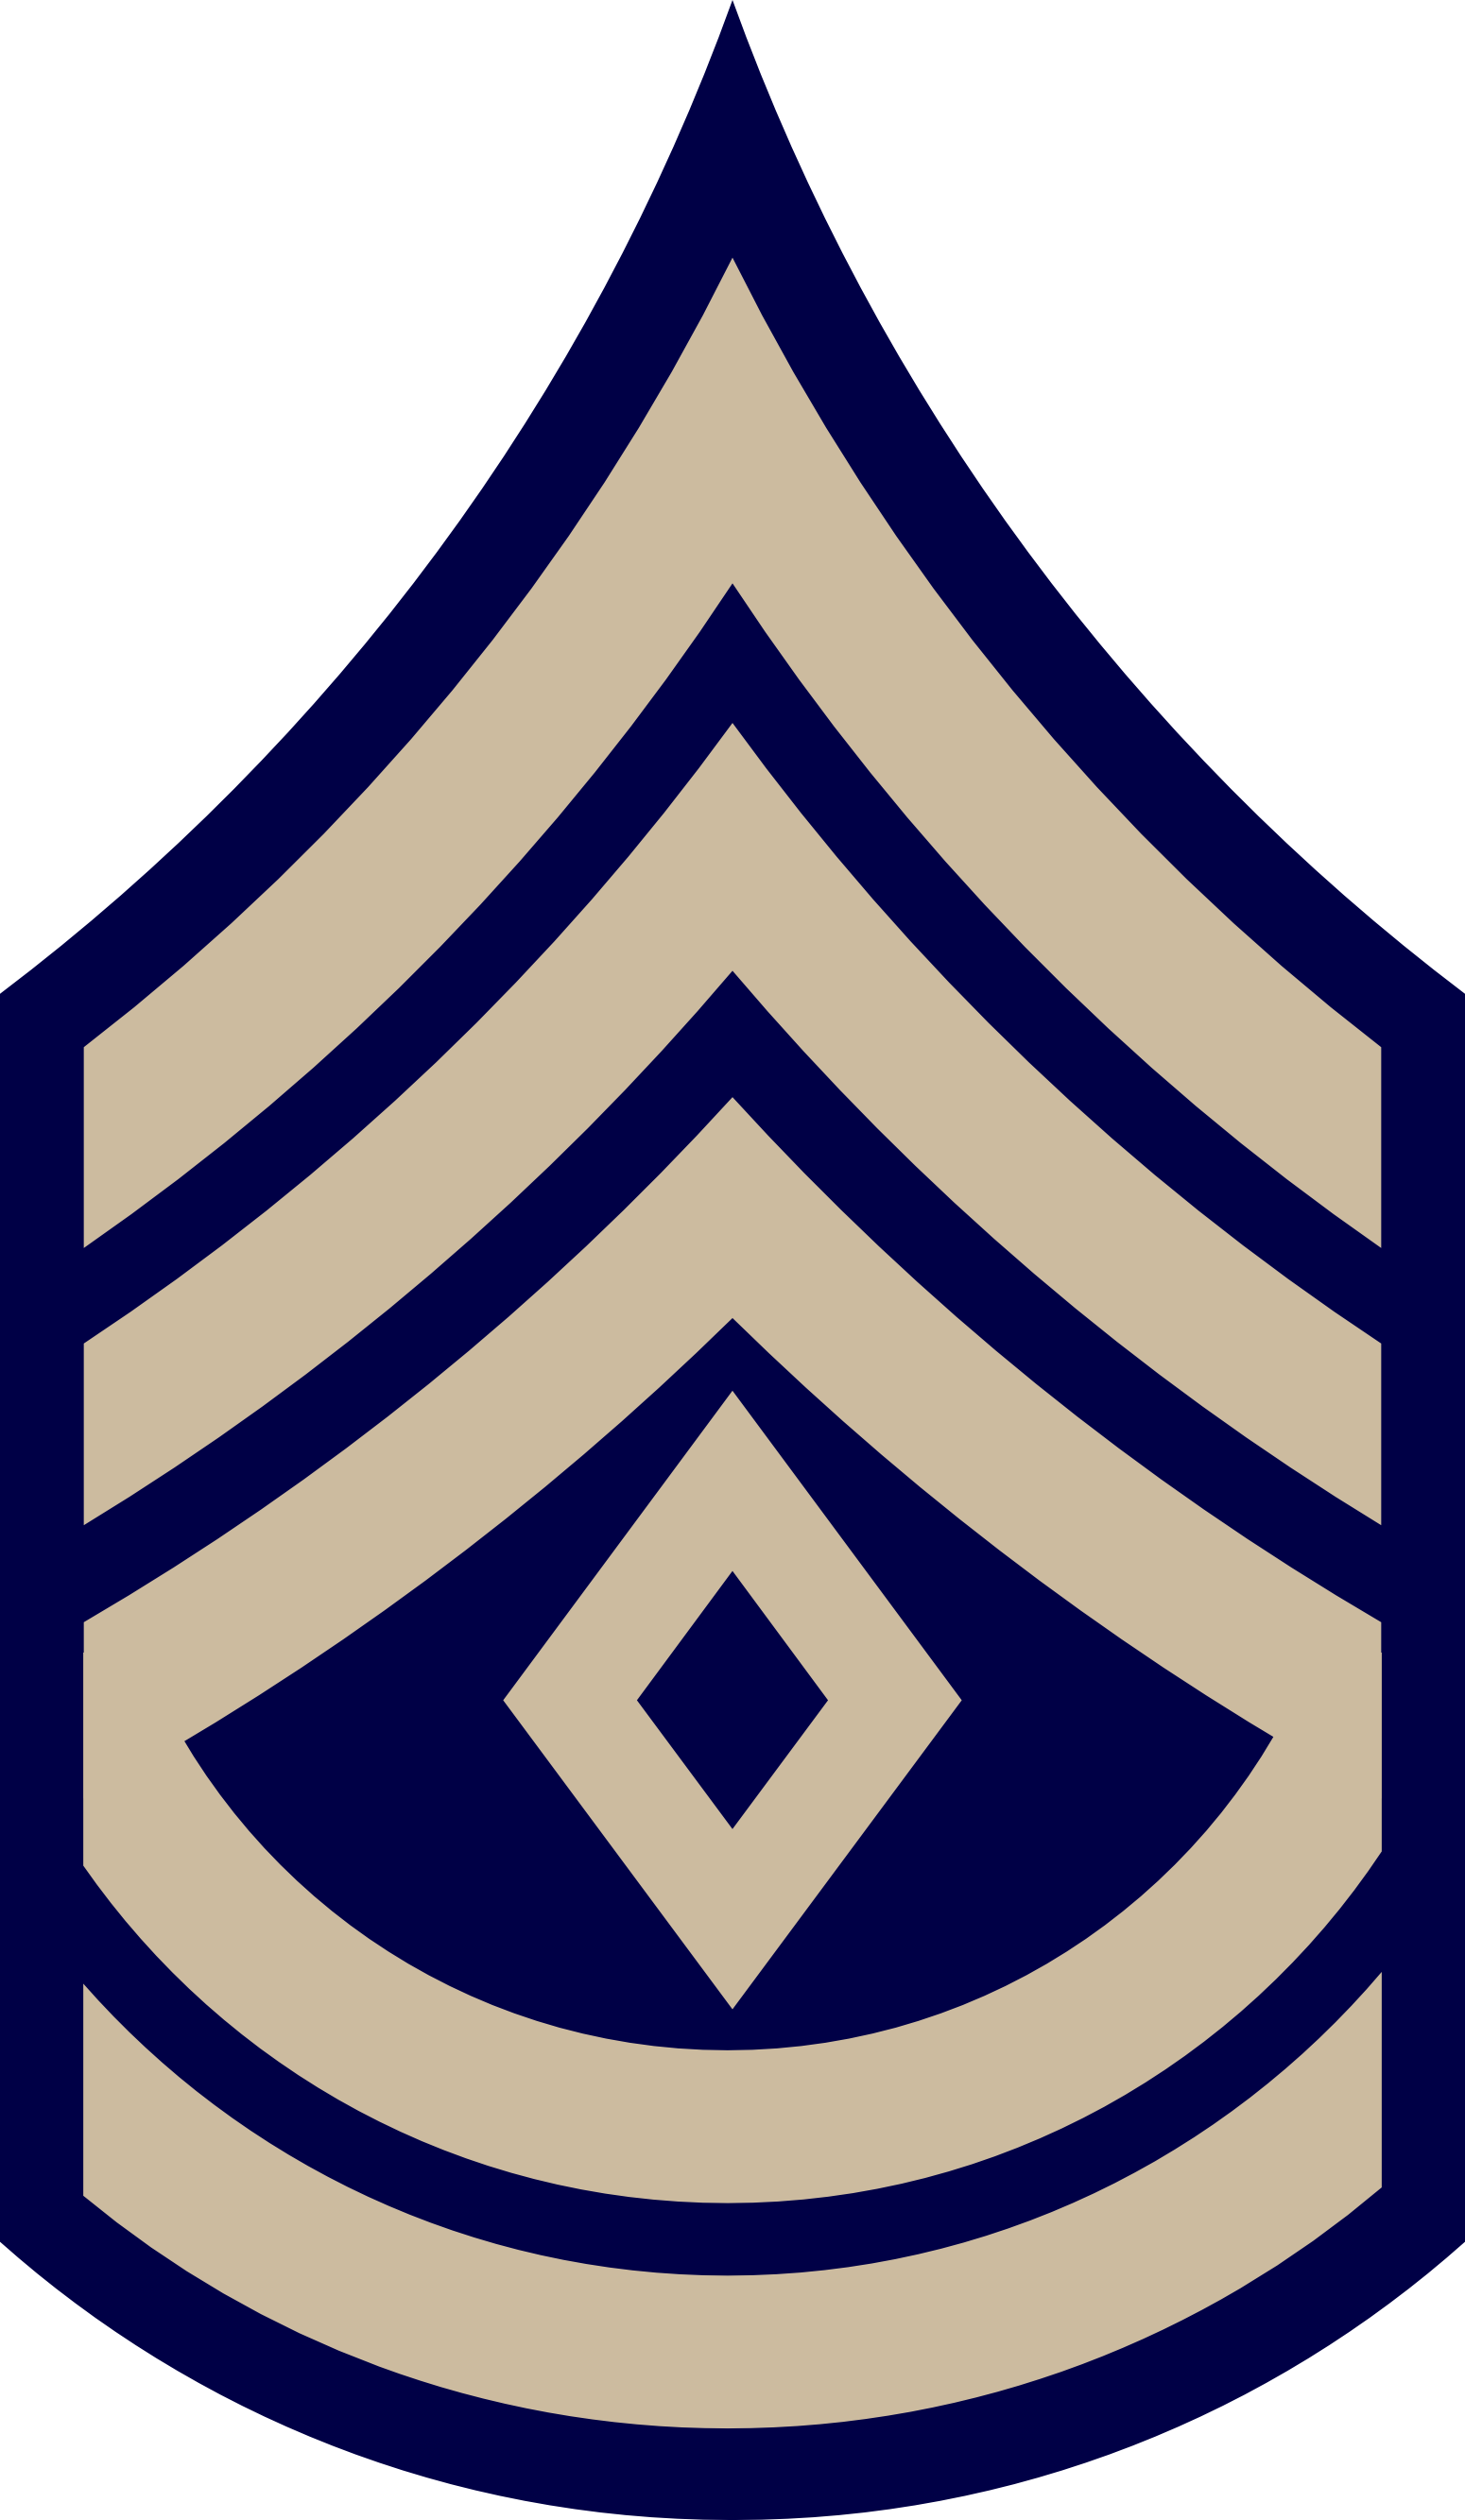 U.S. Army Enlisted Ranks of World War II.